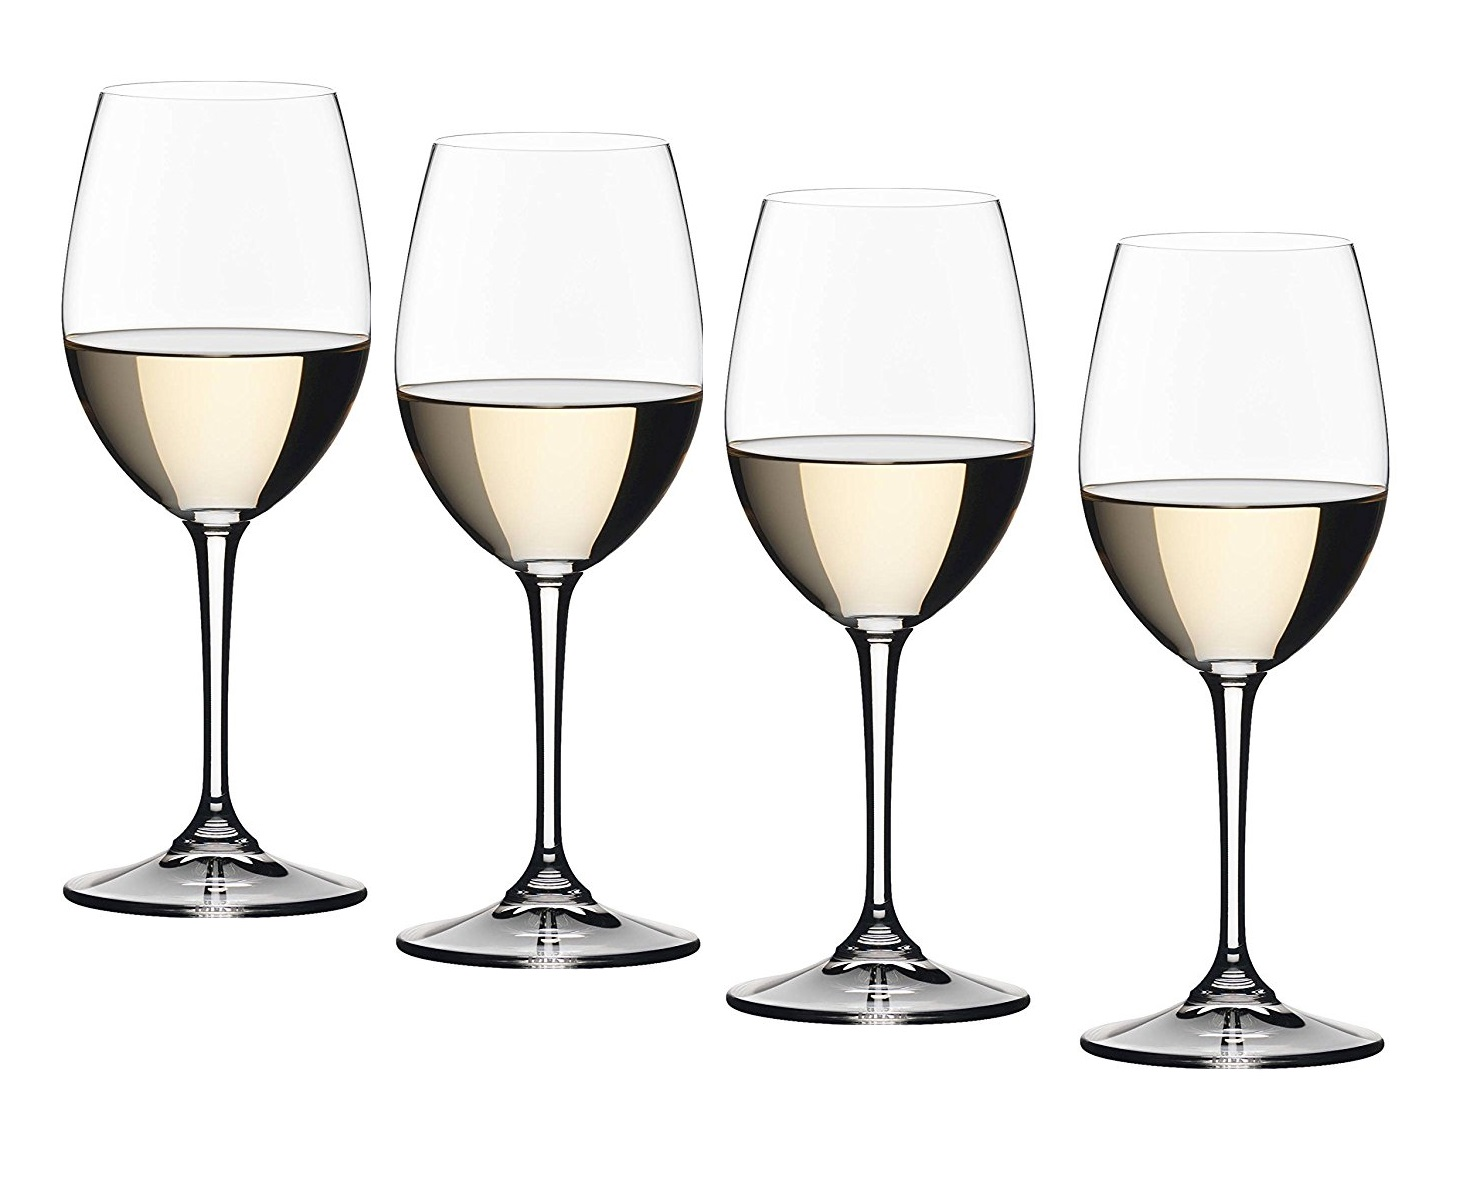 Онлайн каталог PROMENU: Набор бокалов для белого вина Riedel Vivant, 0,34 л, 4 штуки в наборе                                   0484/01